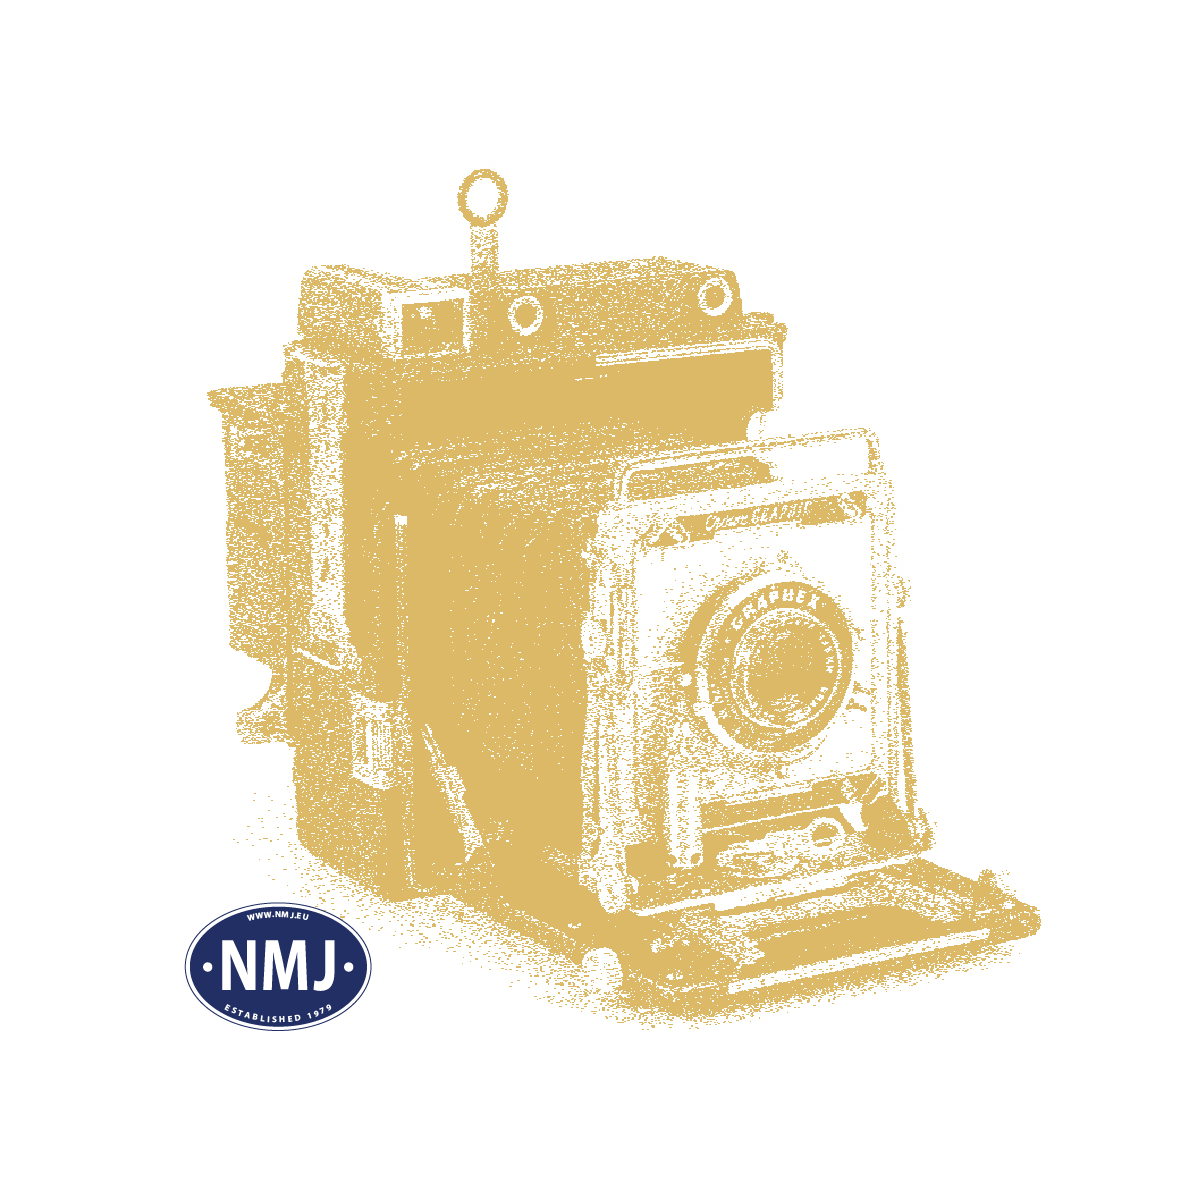 NMJT134.301 - NMJ Topline NSB DF37 21307, Nydesign